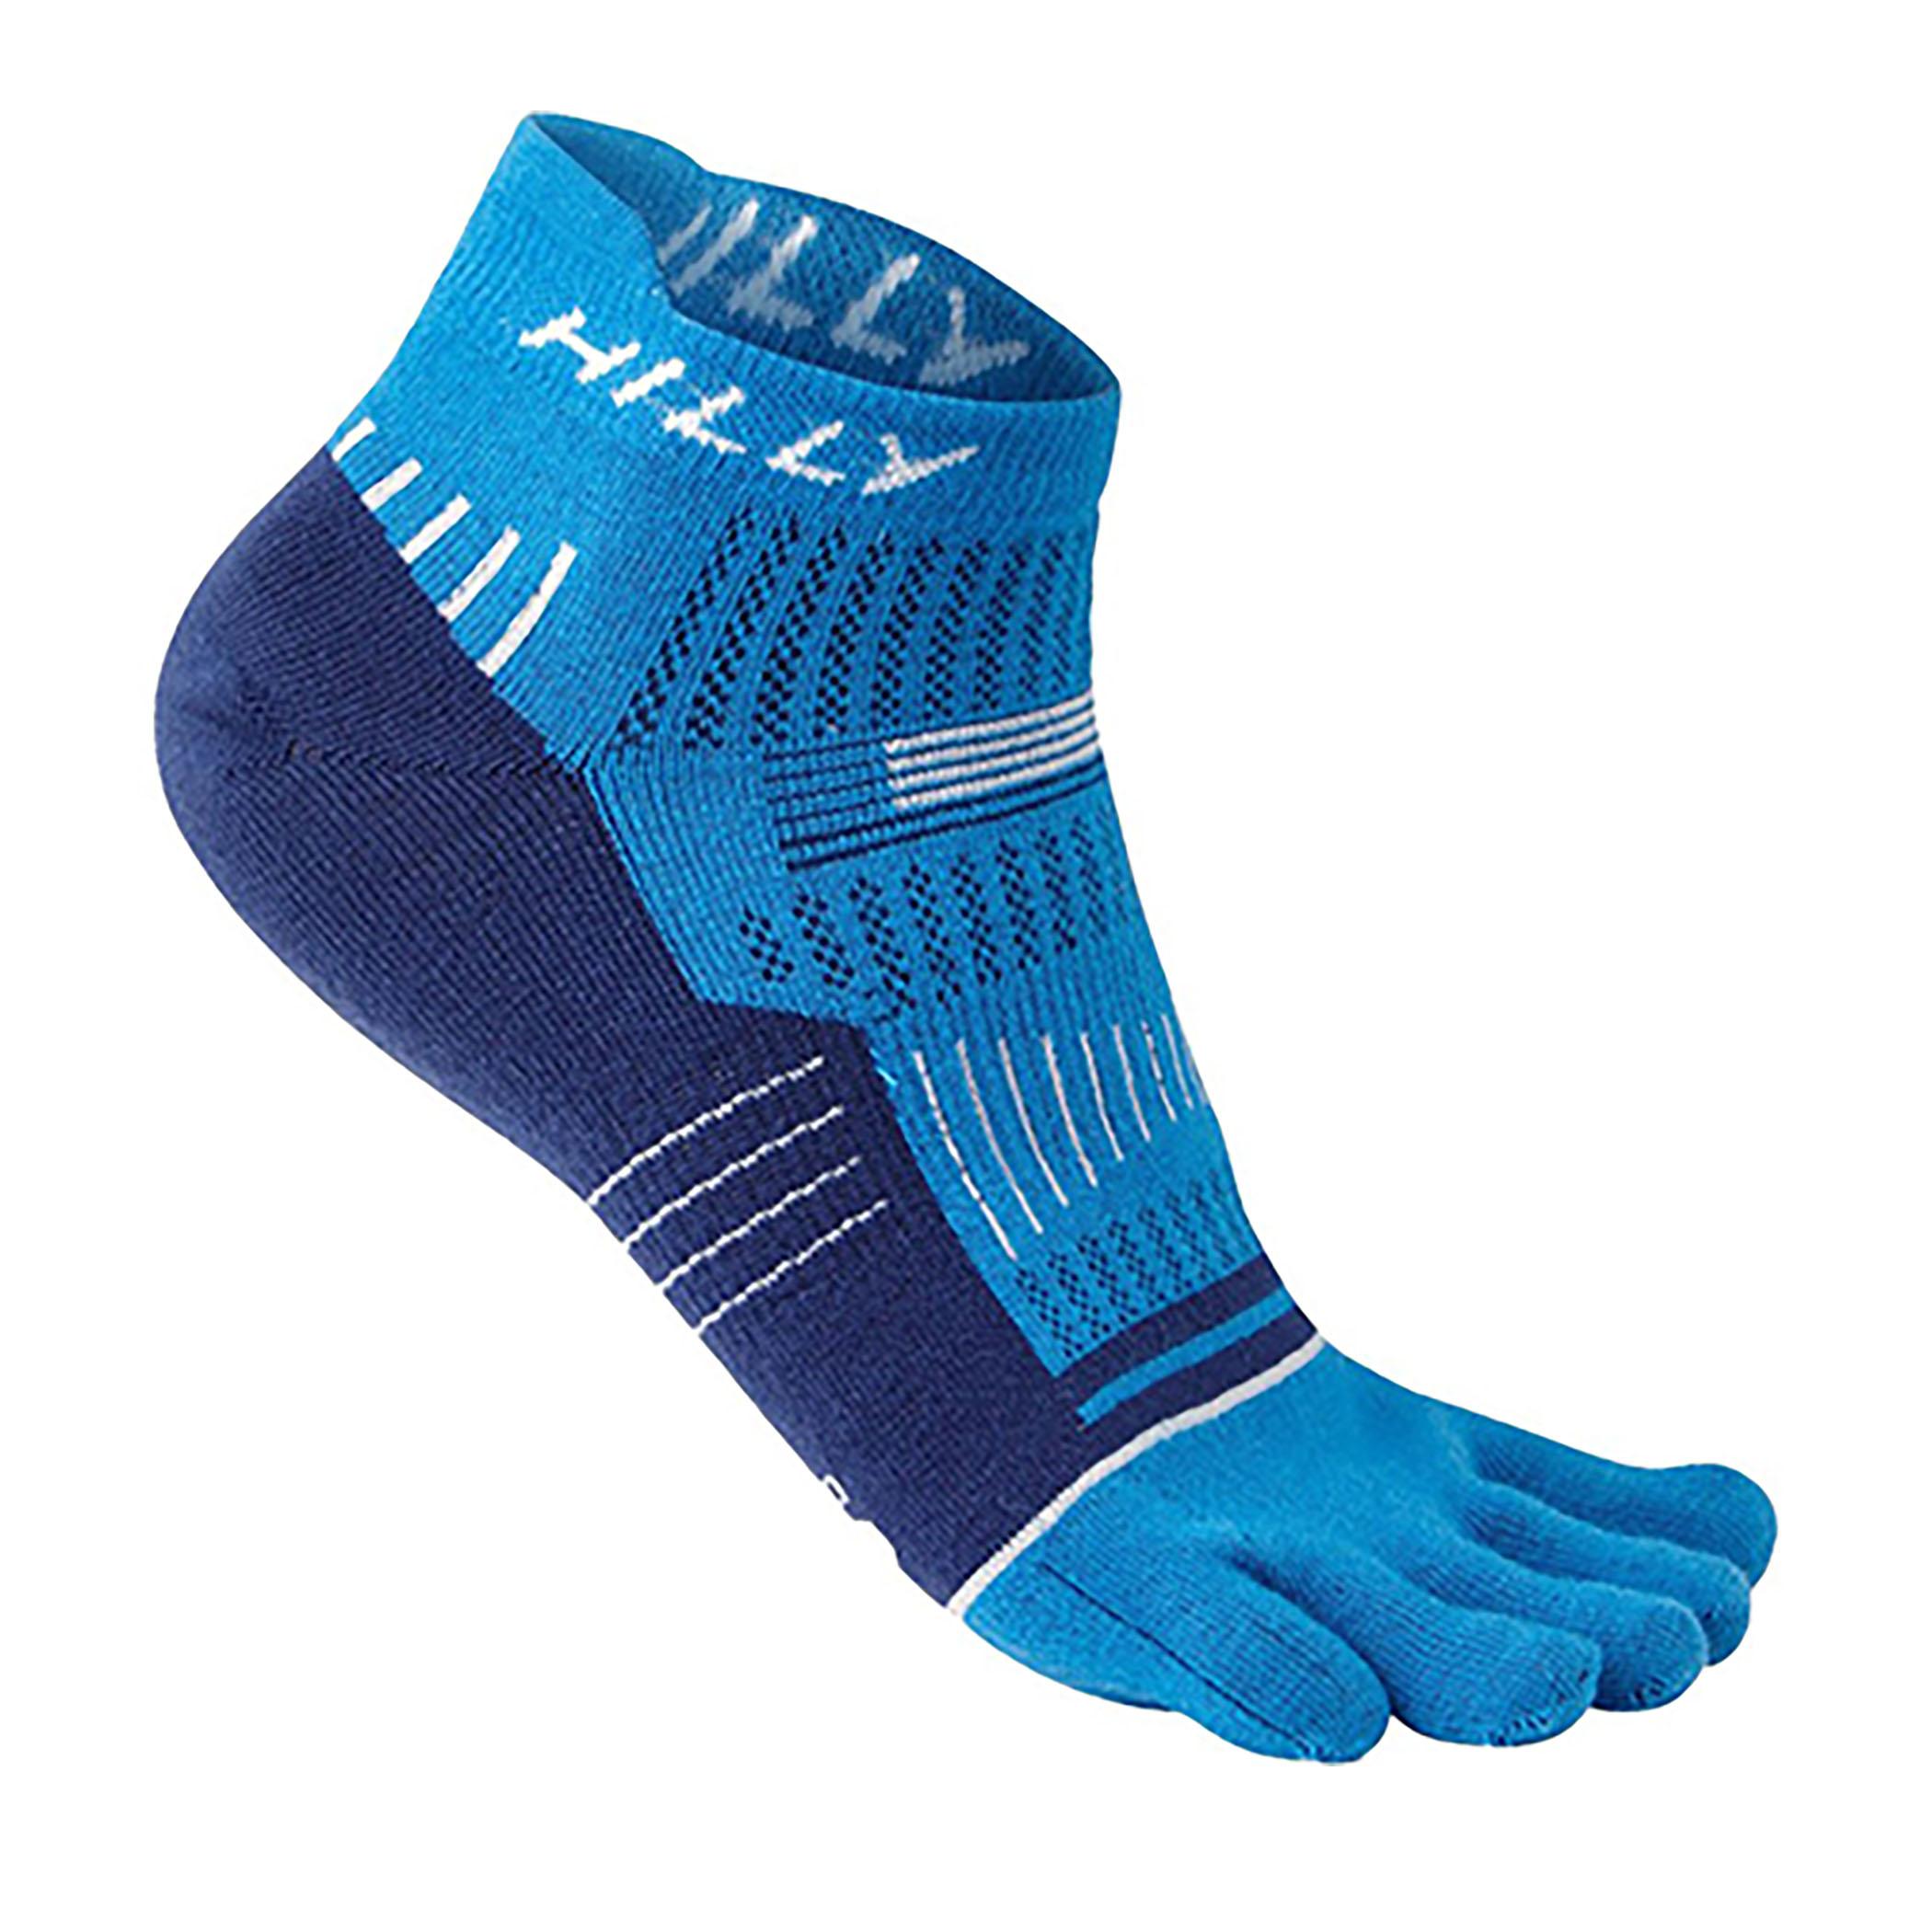 Unisex Toe Sock